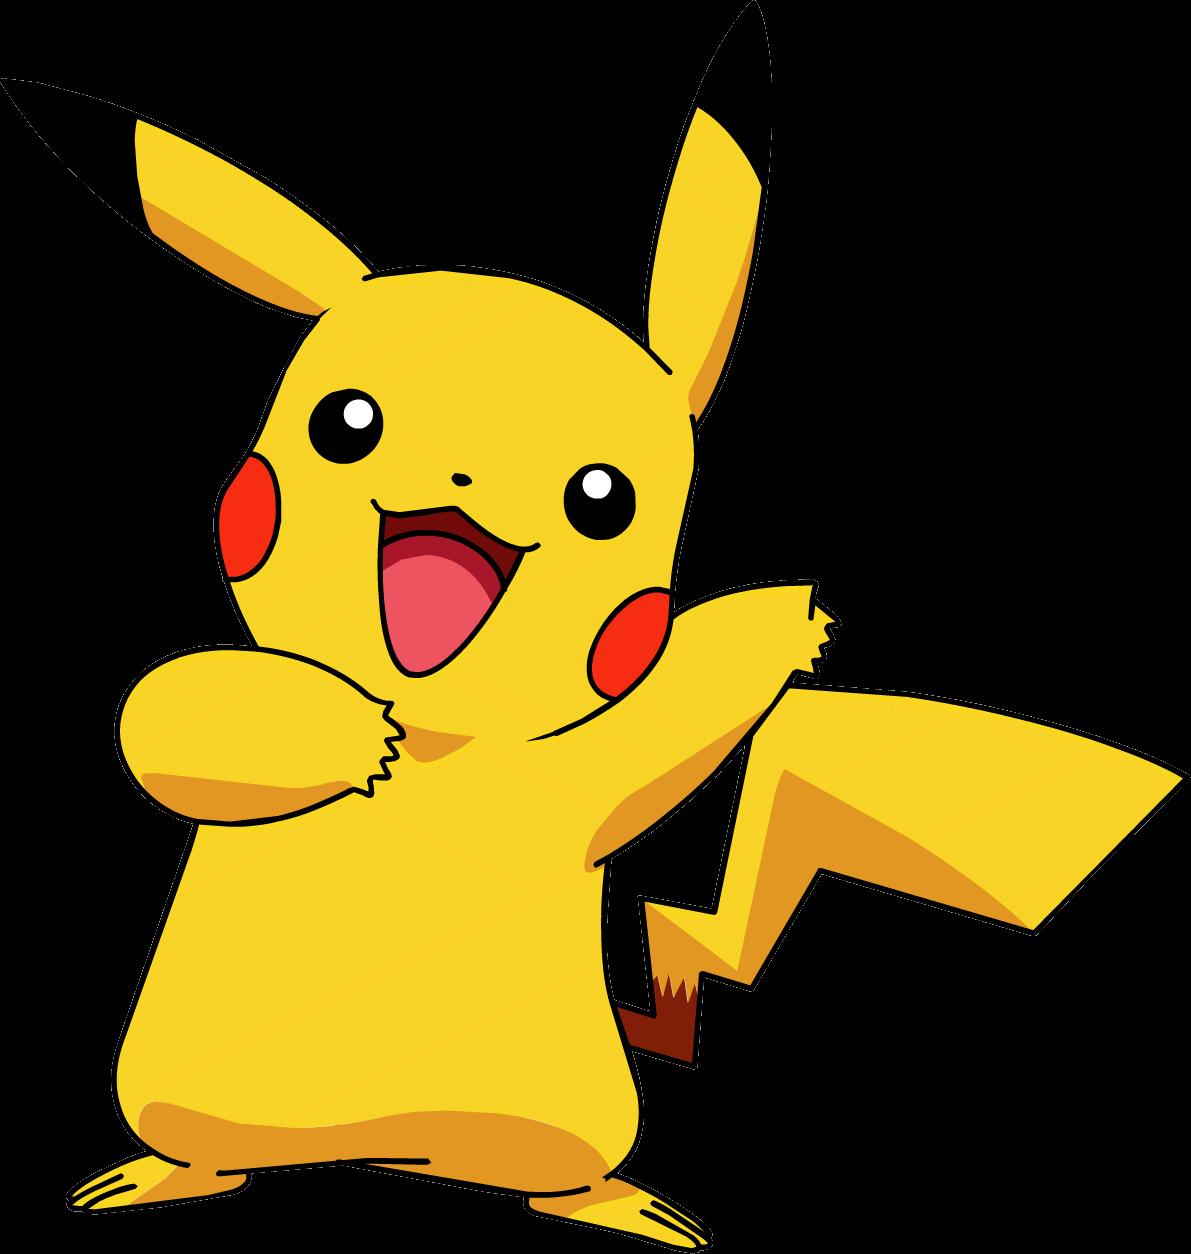 Pokemon Pikachu png clipart